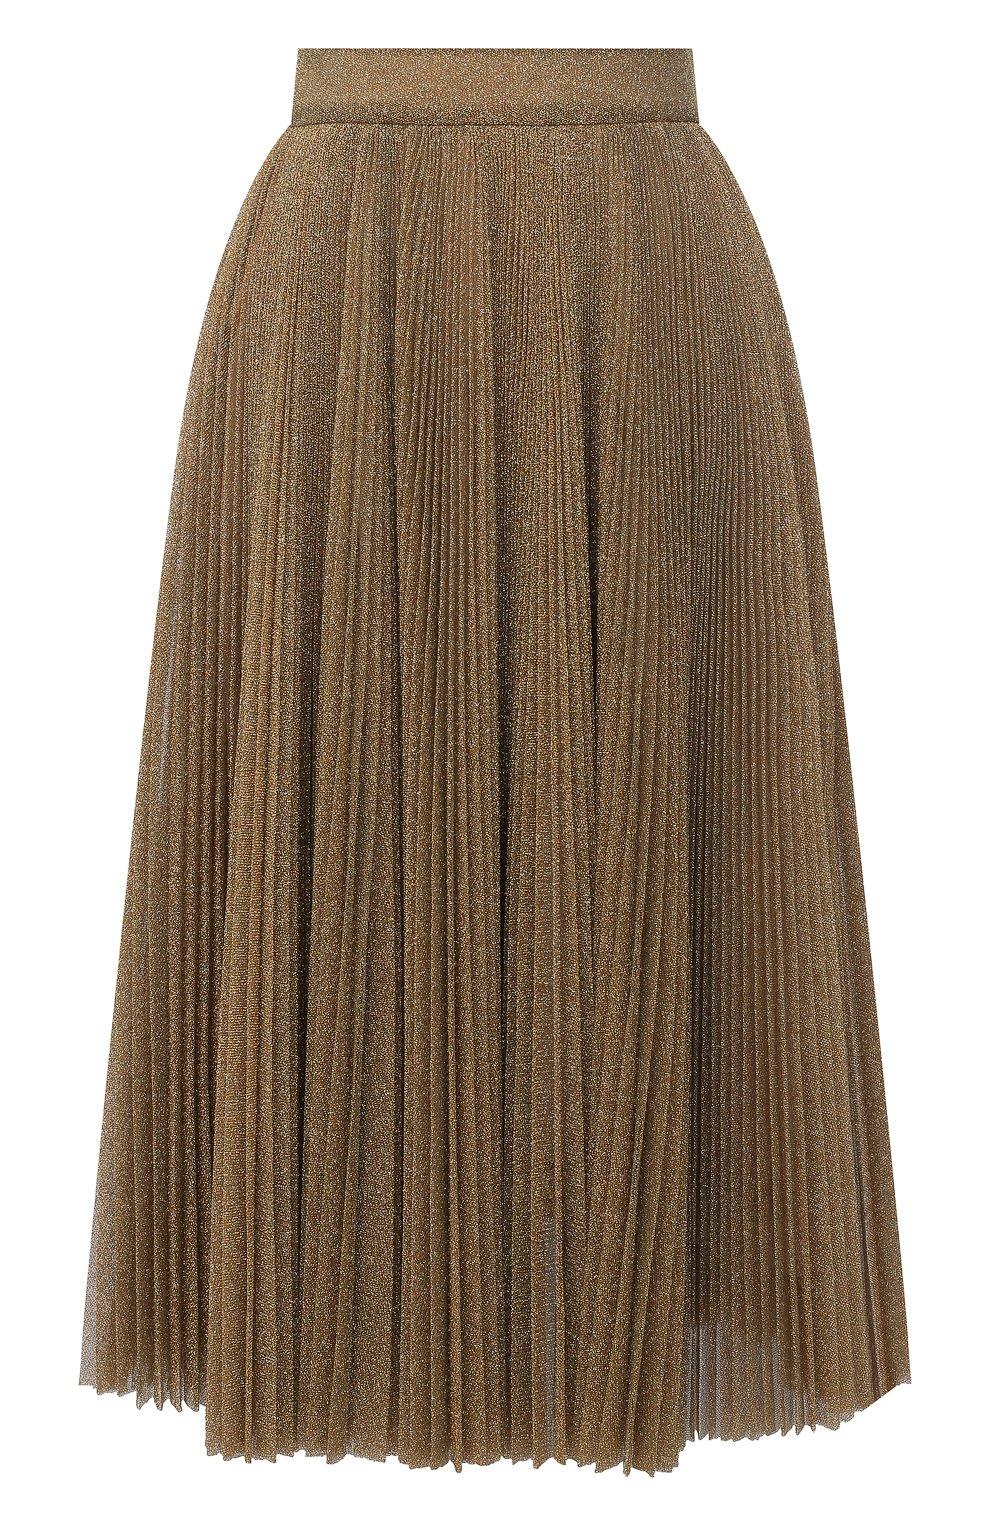 Женская юбка DOLCE & GABBANA бронзового цвета, арт. F4BYWT/FLMGR | Фото 1